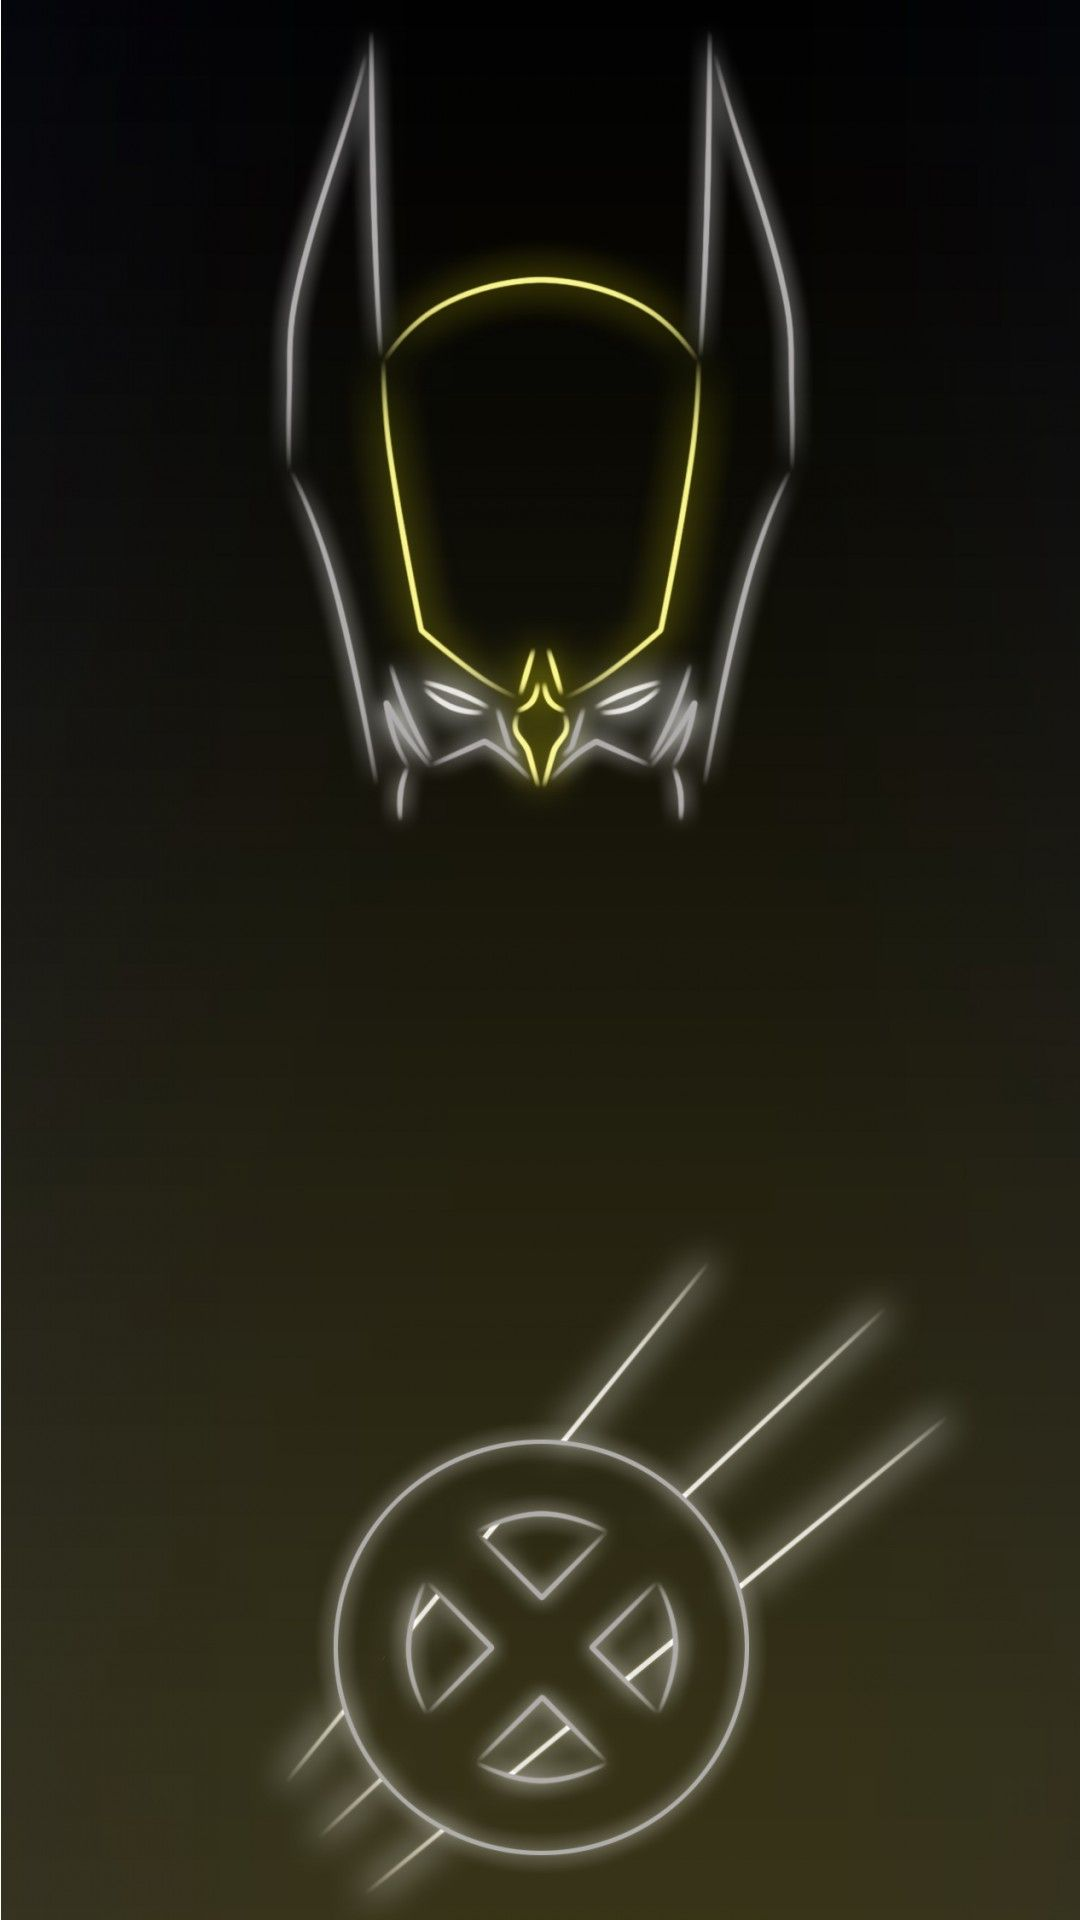 Neon Light Hero Wolverine 1080 X 1920 Wallpapers Co San De Tai Mien Phi